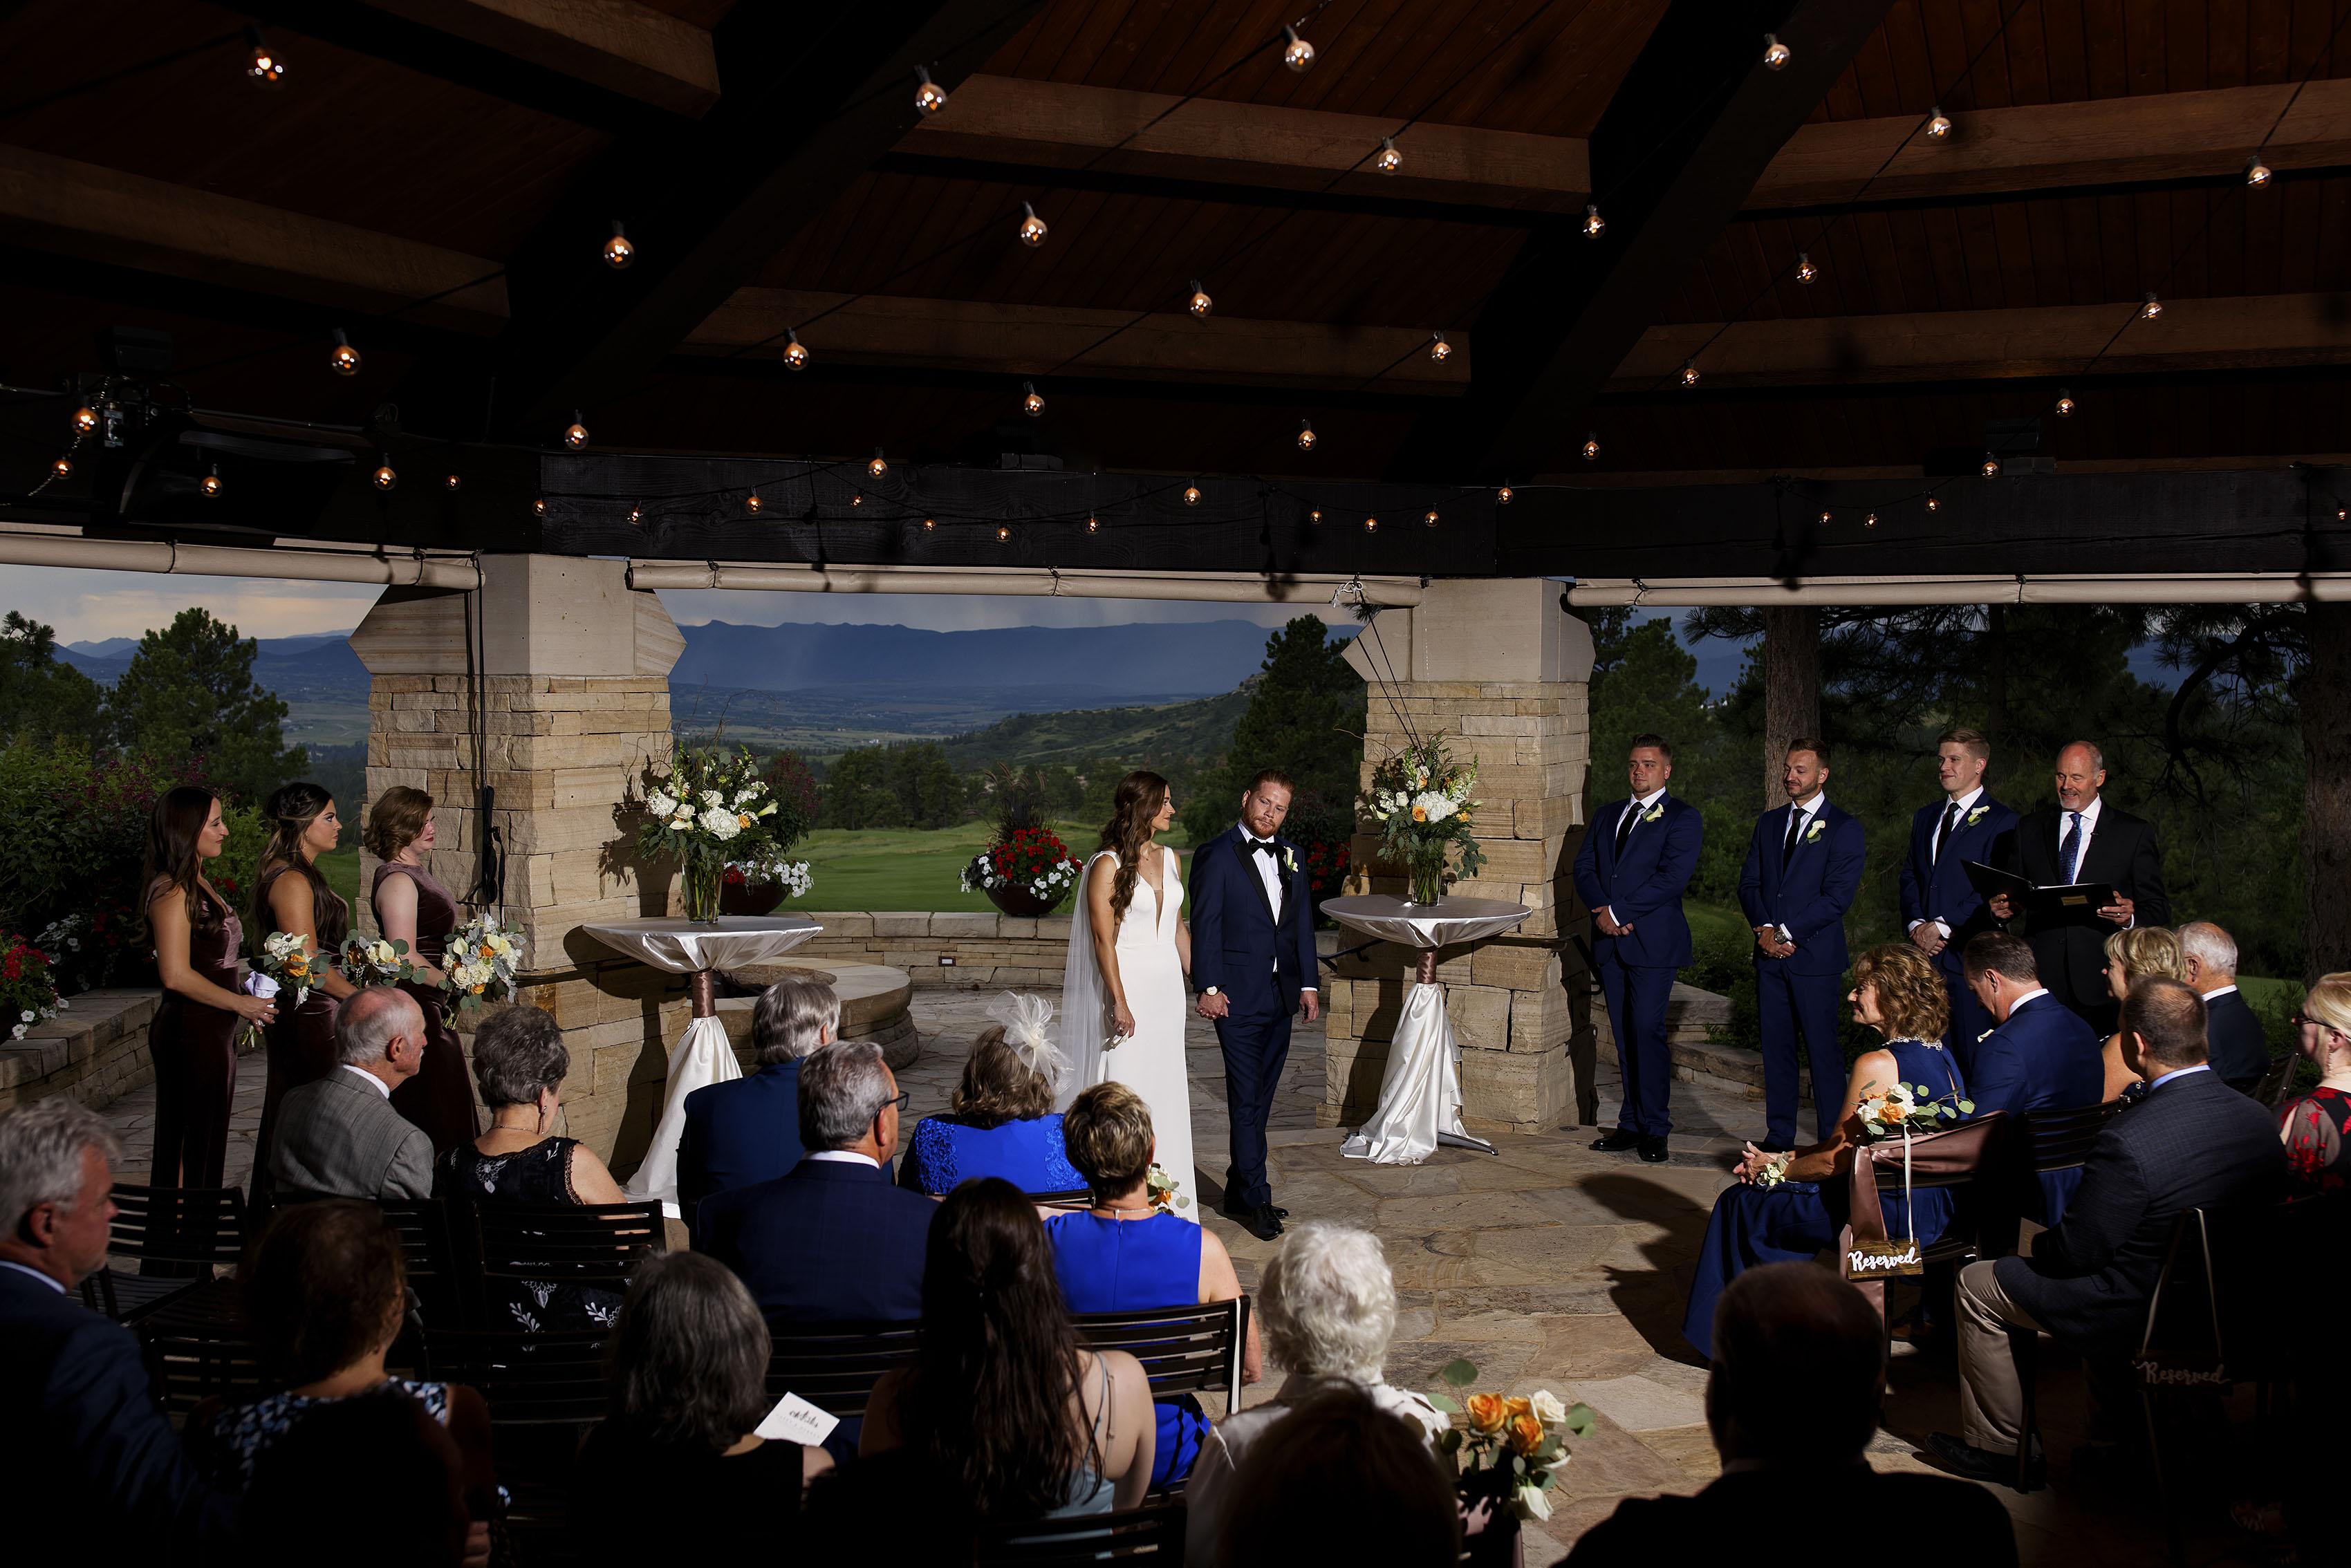 Wedding ceremony at the Sanctuary pavillion